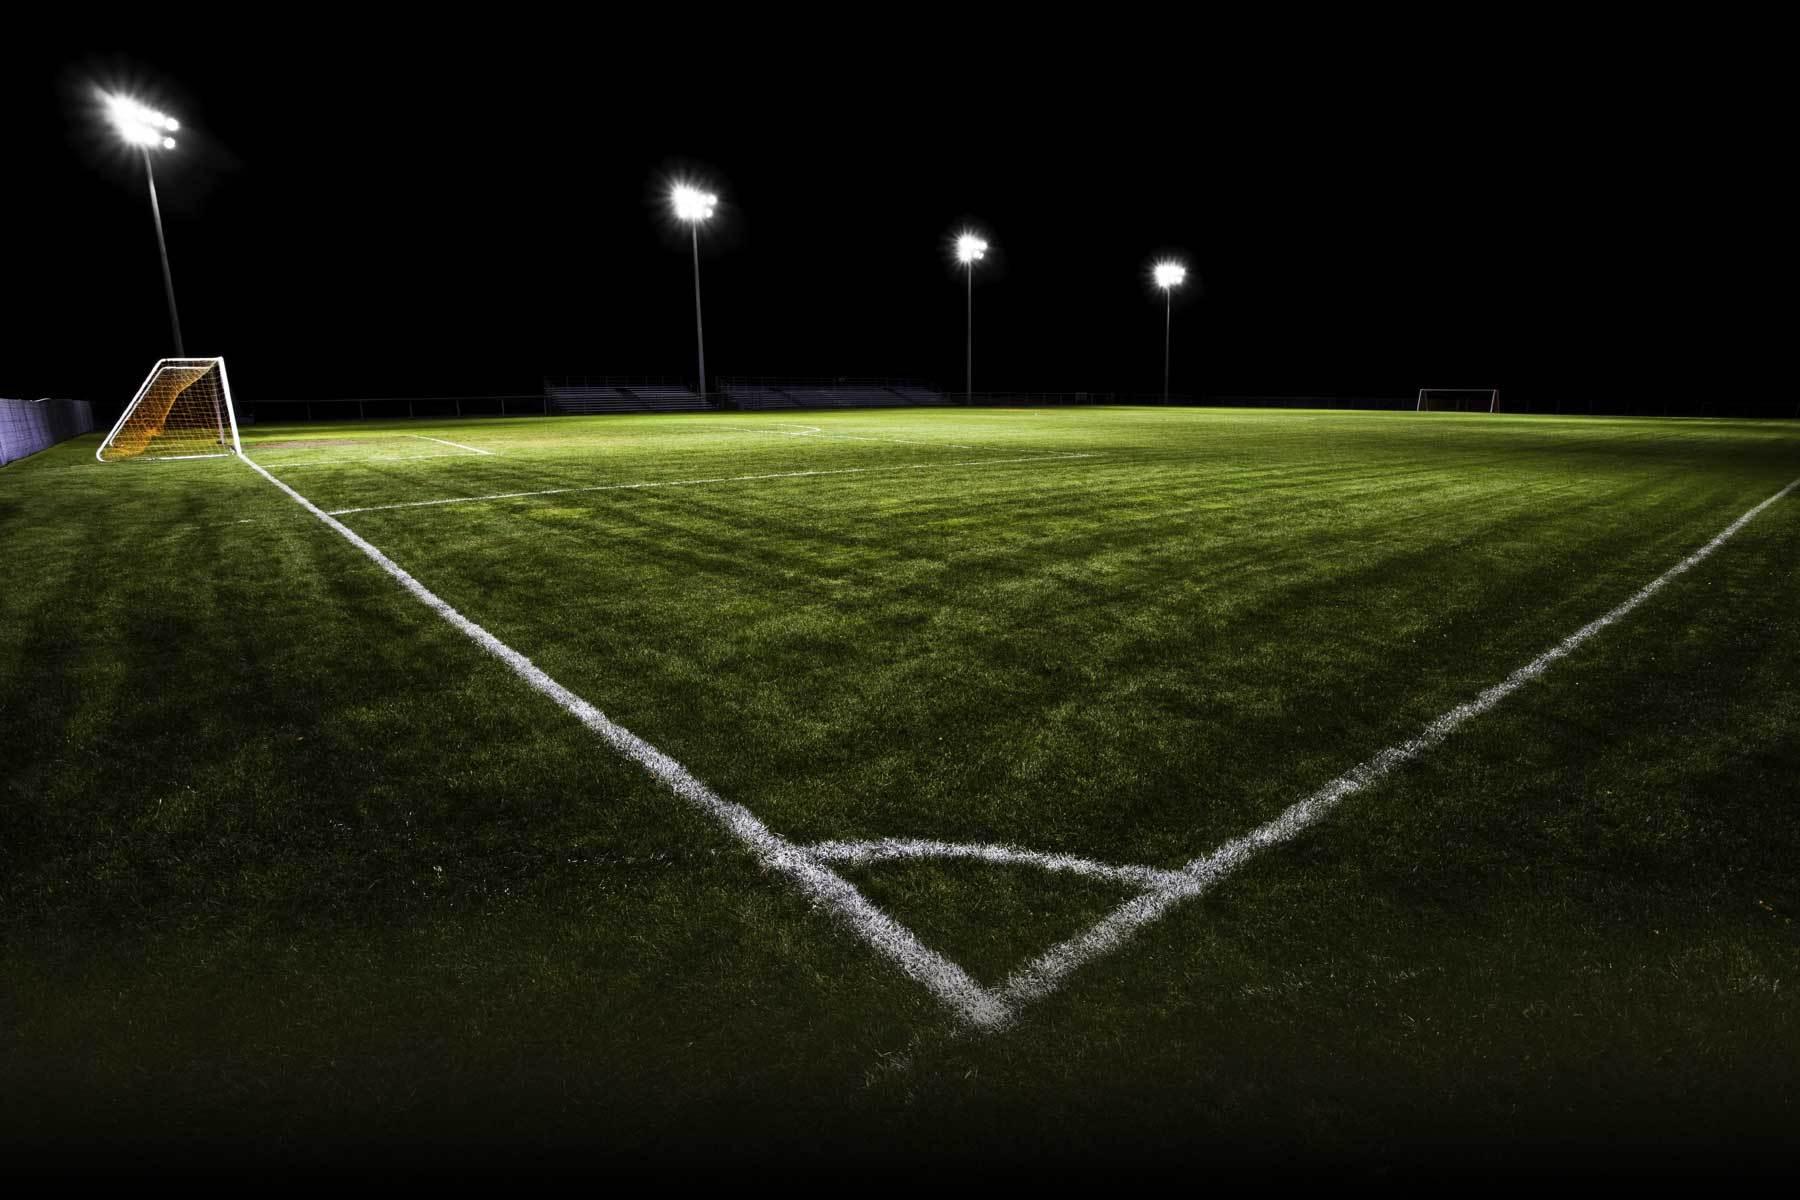 soccer field night image